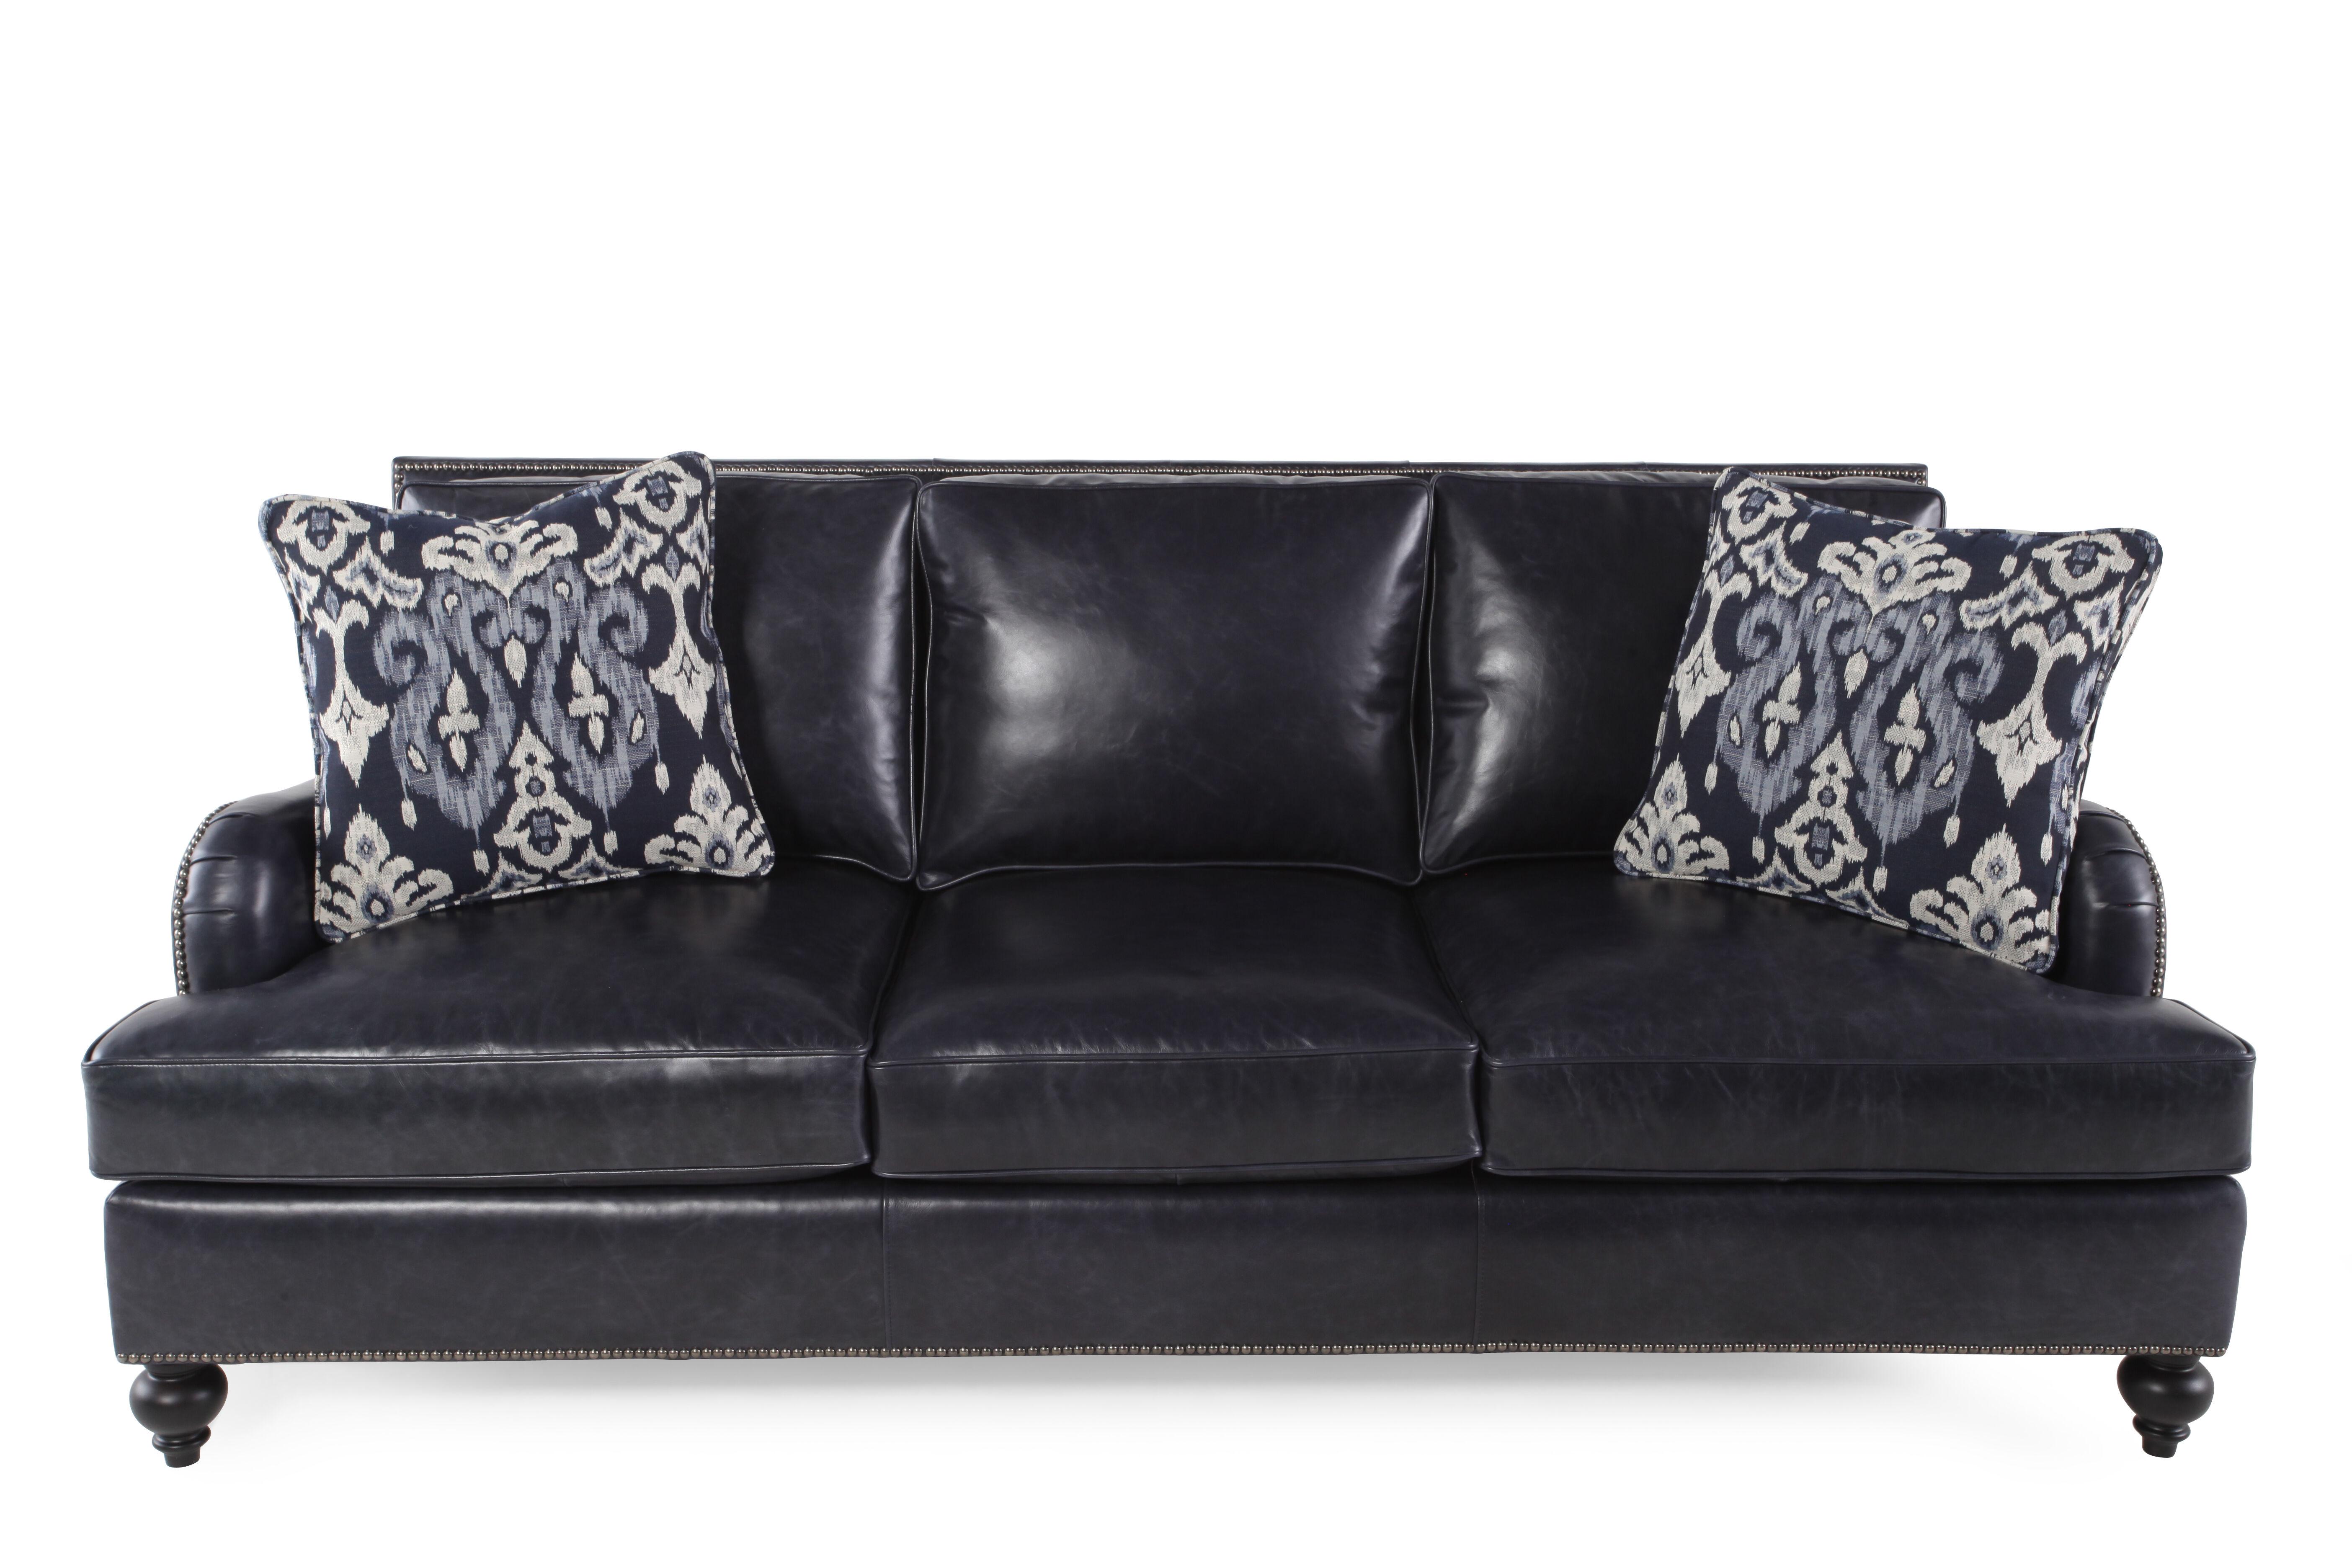 Bernhardt Beckford Leather Sofa; Bernhardt Beckford Leather Sofa ...